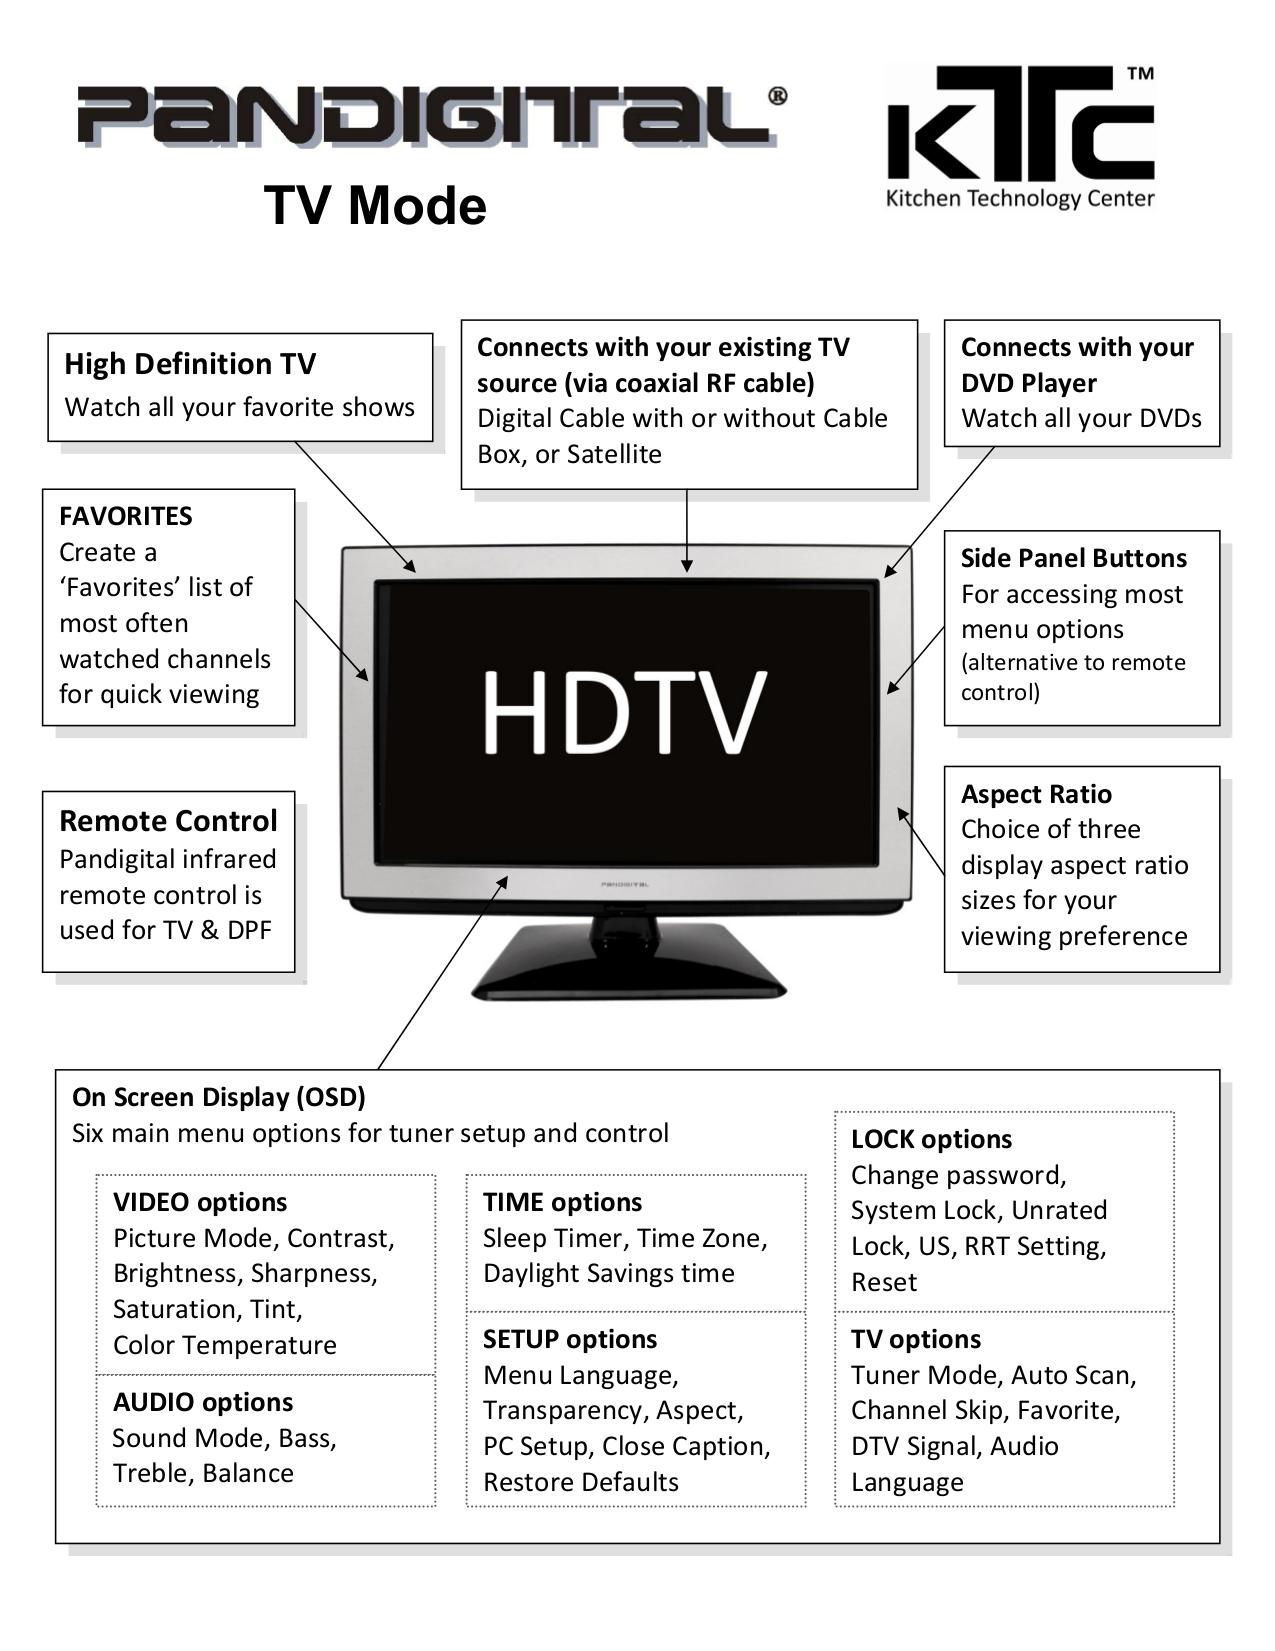 Download free pdf for Pandigital PANTV1512 Digital Photo Frame manual